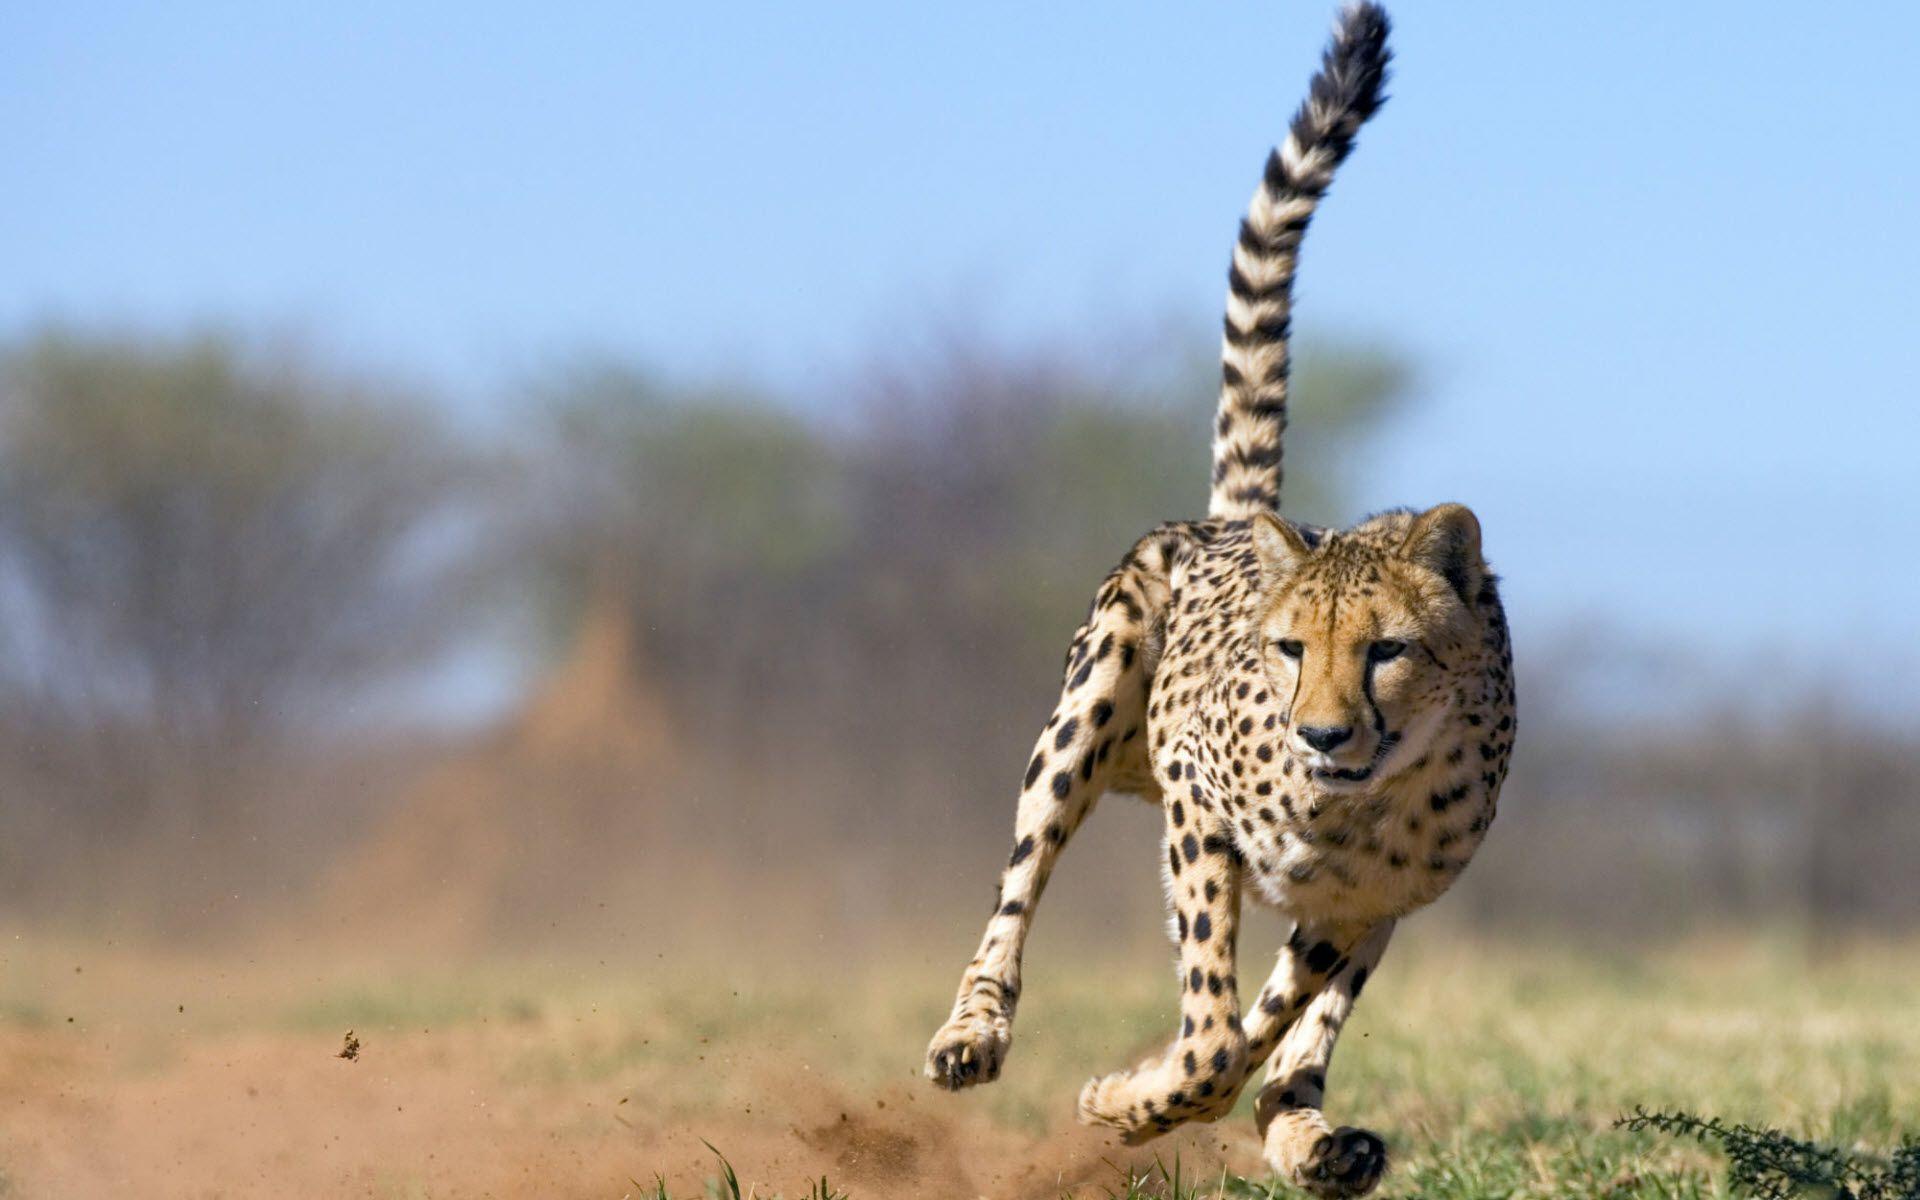 Cheetah images Cheetah HD wallpaper and background photos